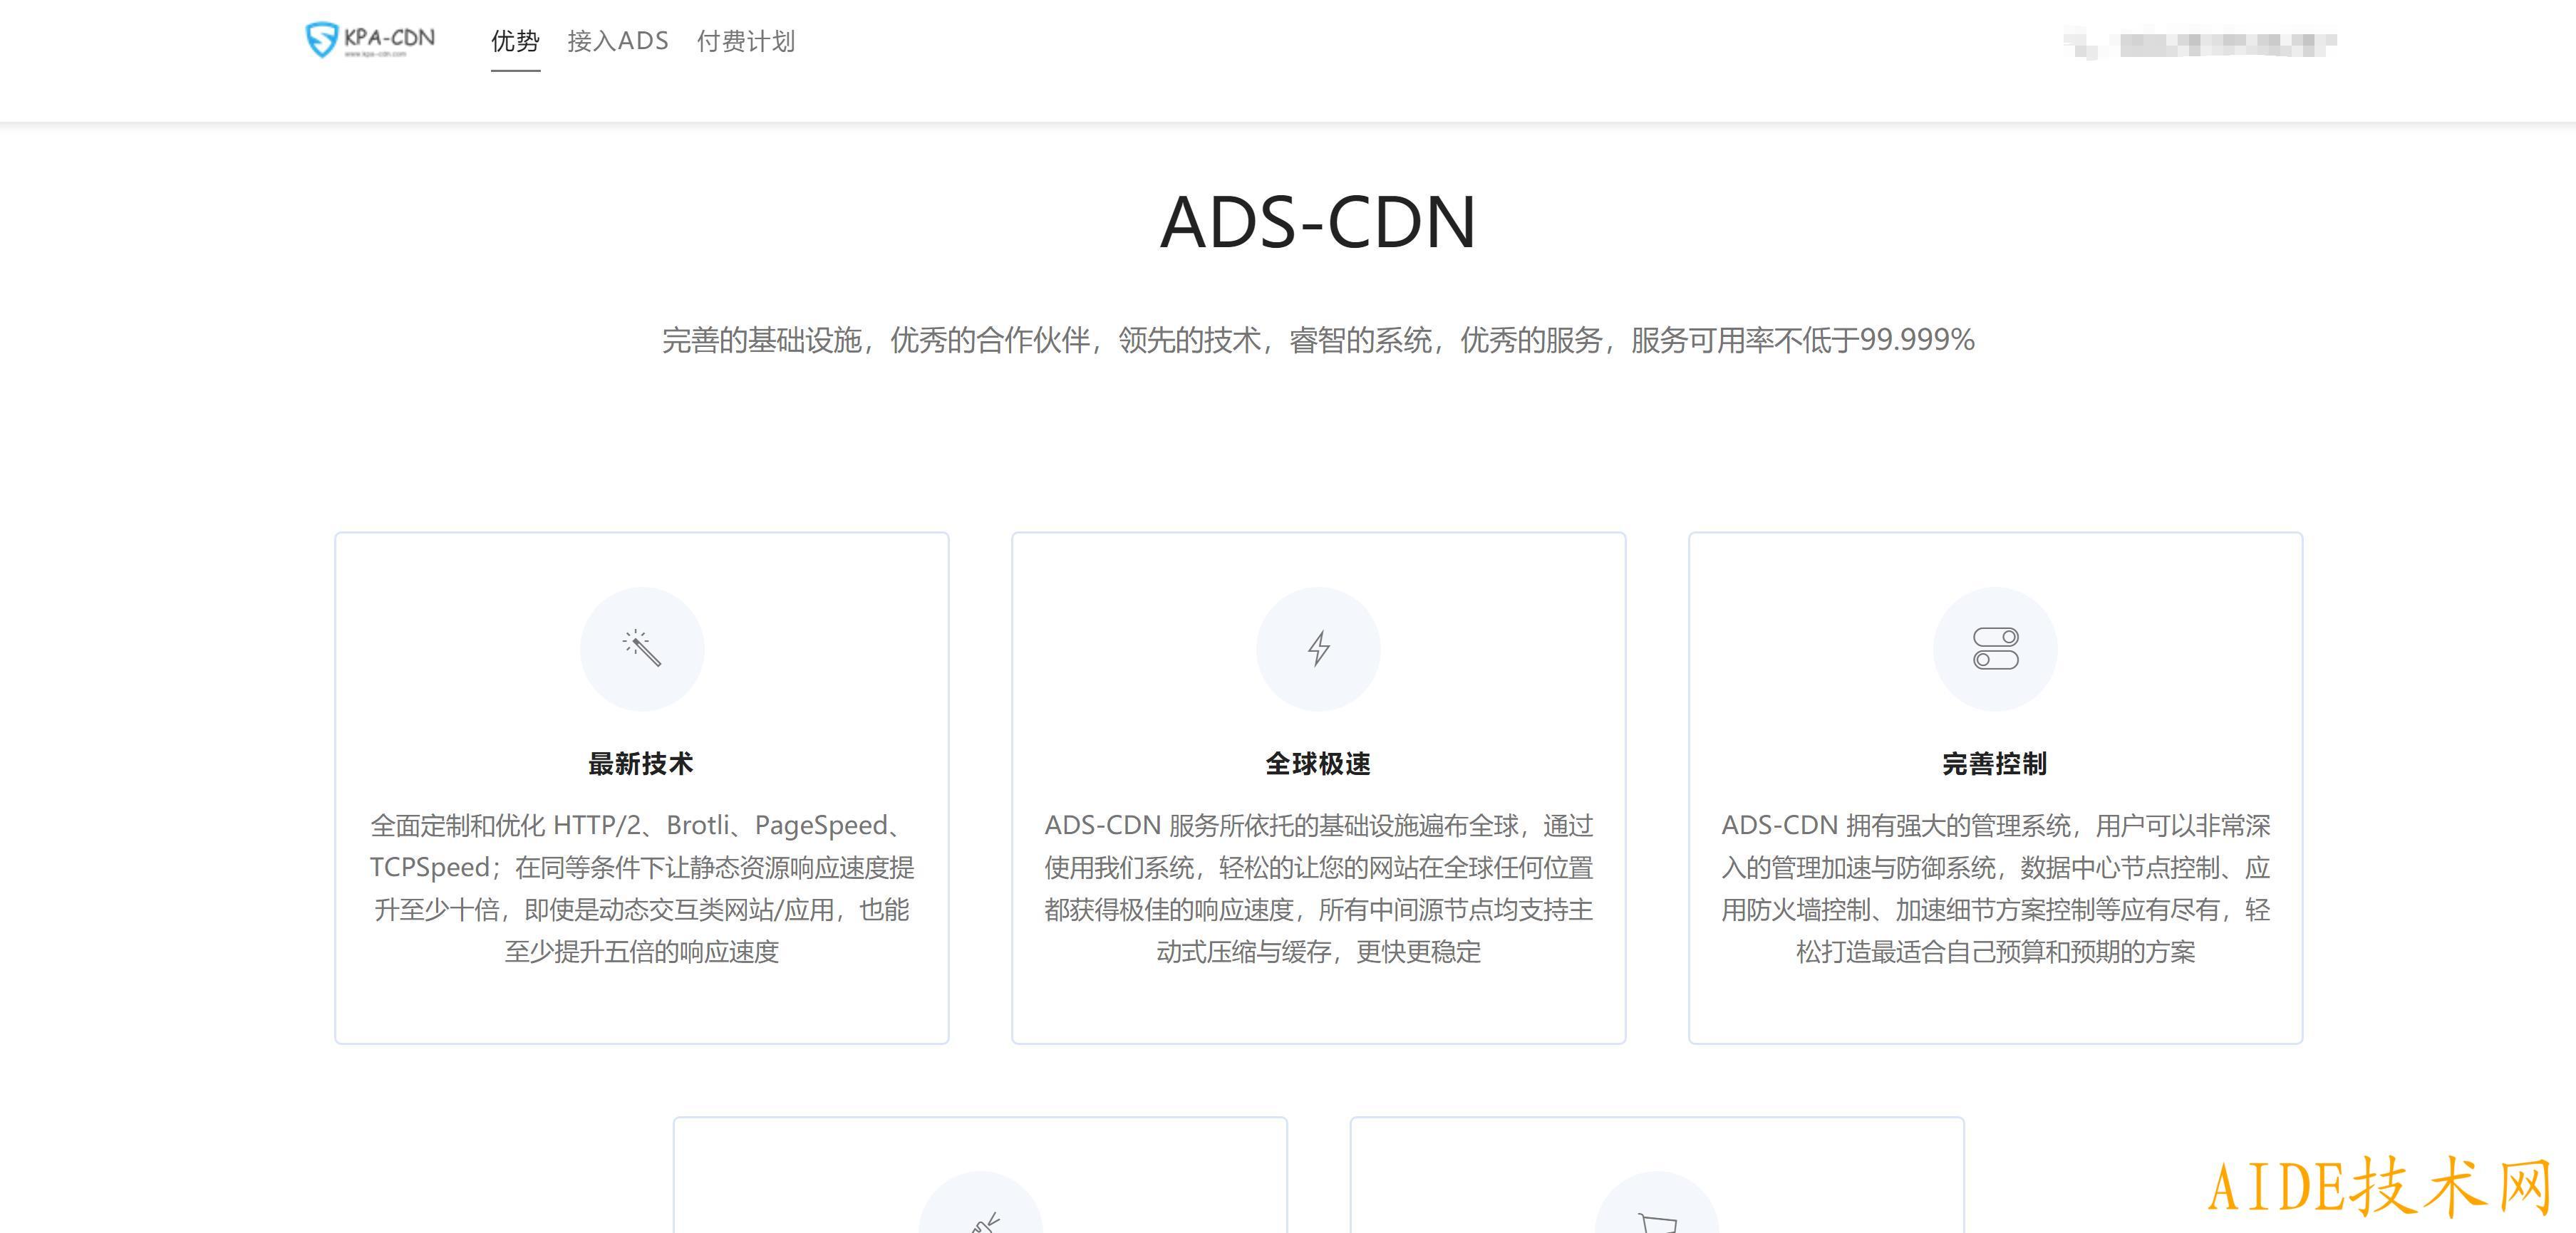 CDN个人黑色主页HMTL源码 前言